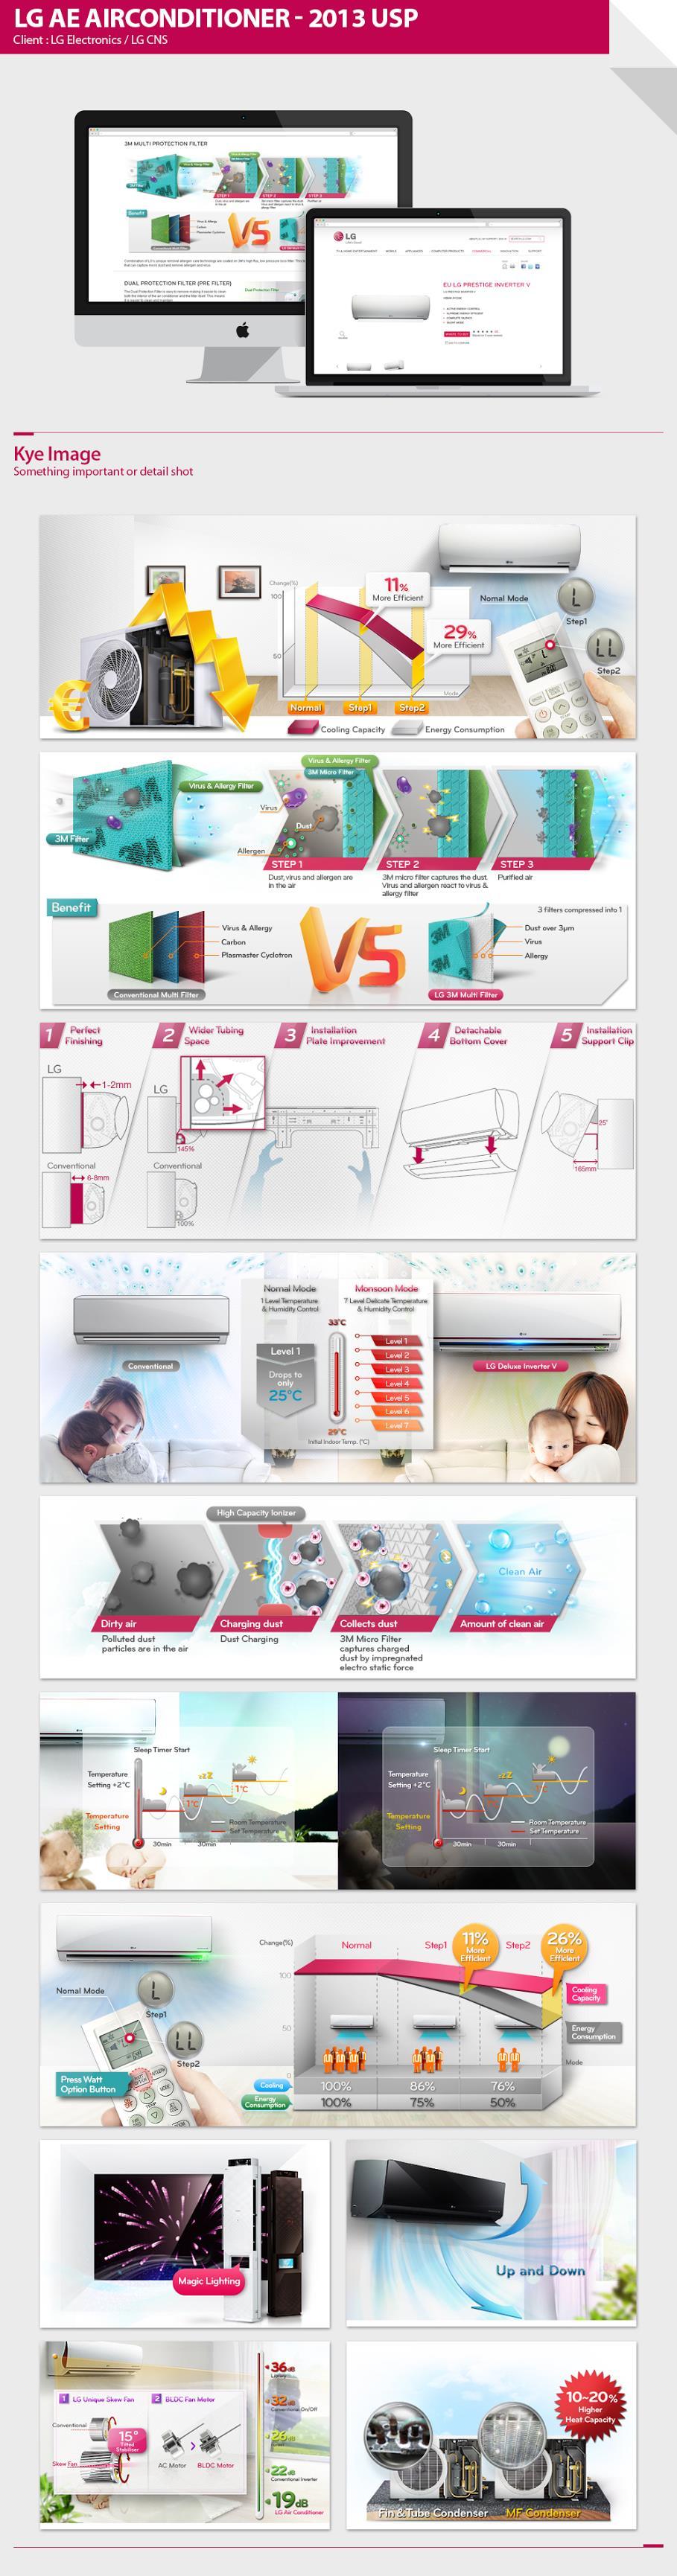 LG AE Airconditioner - 2013 USP https://www.youtube.com/watch?v=YLvuoHymC0Y